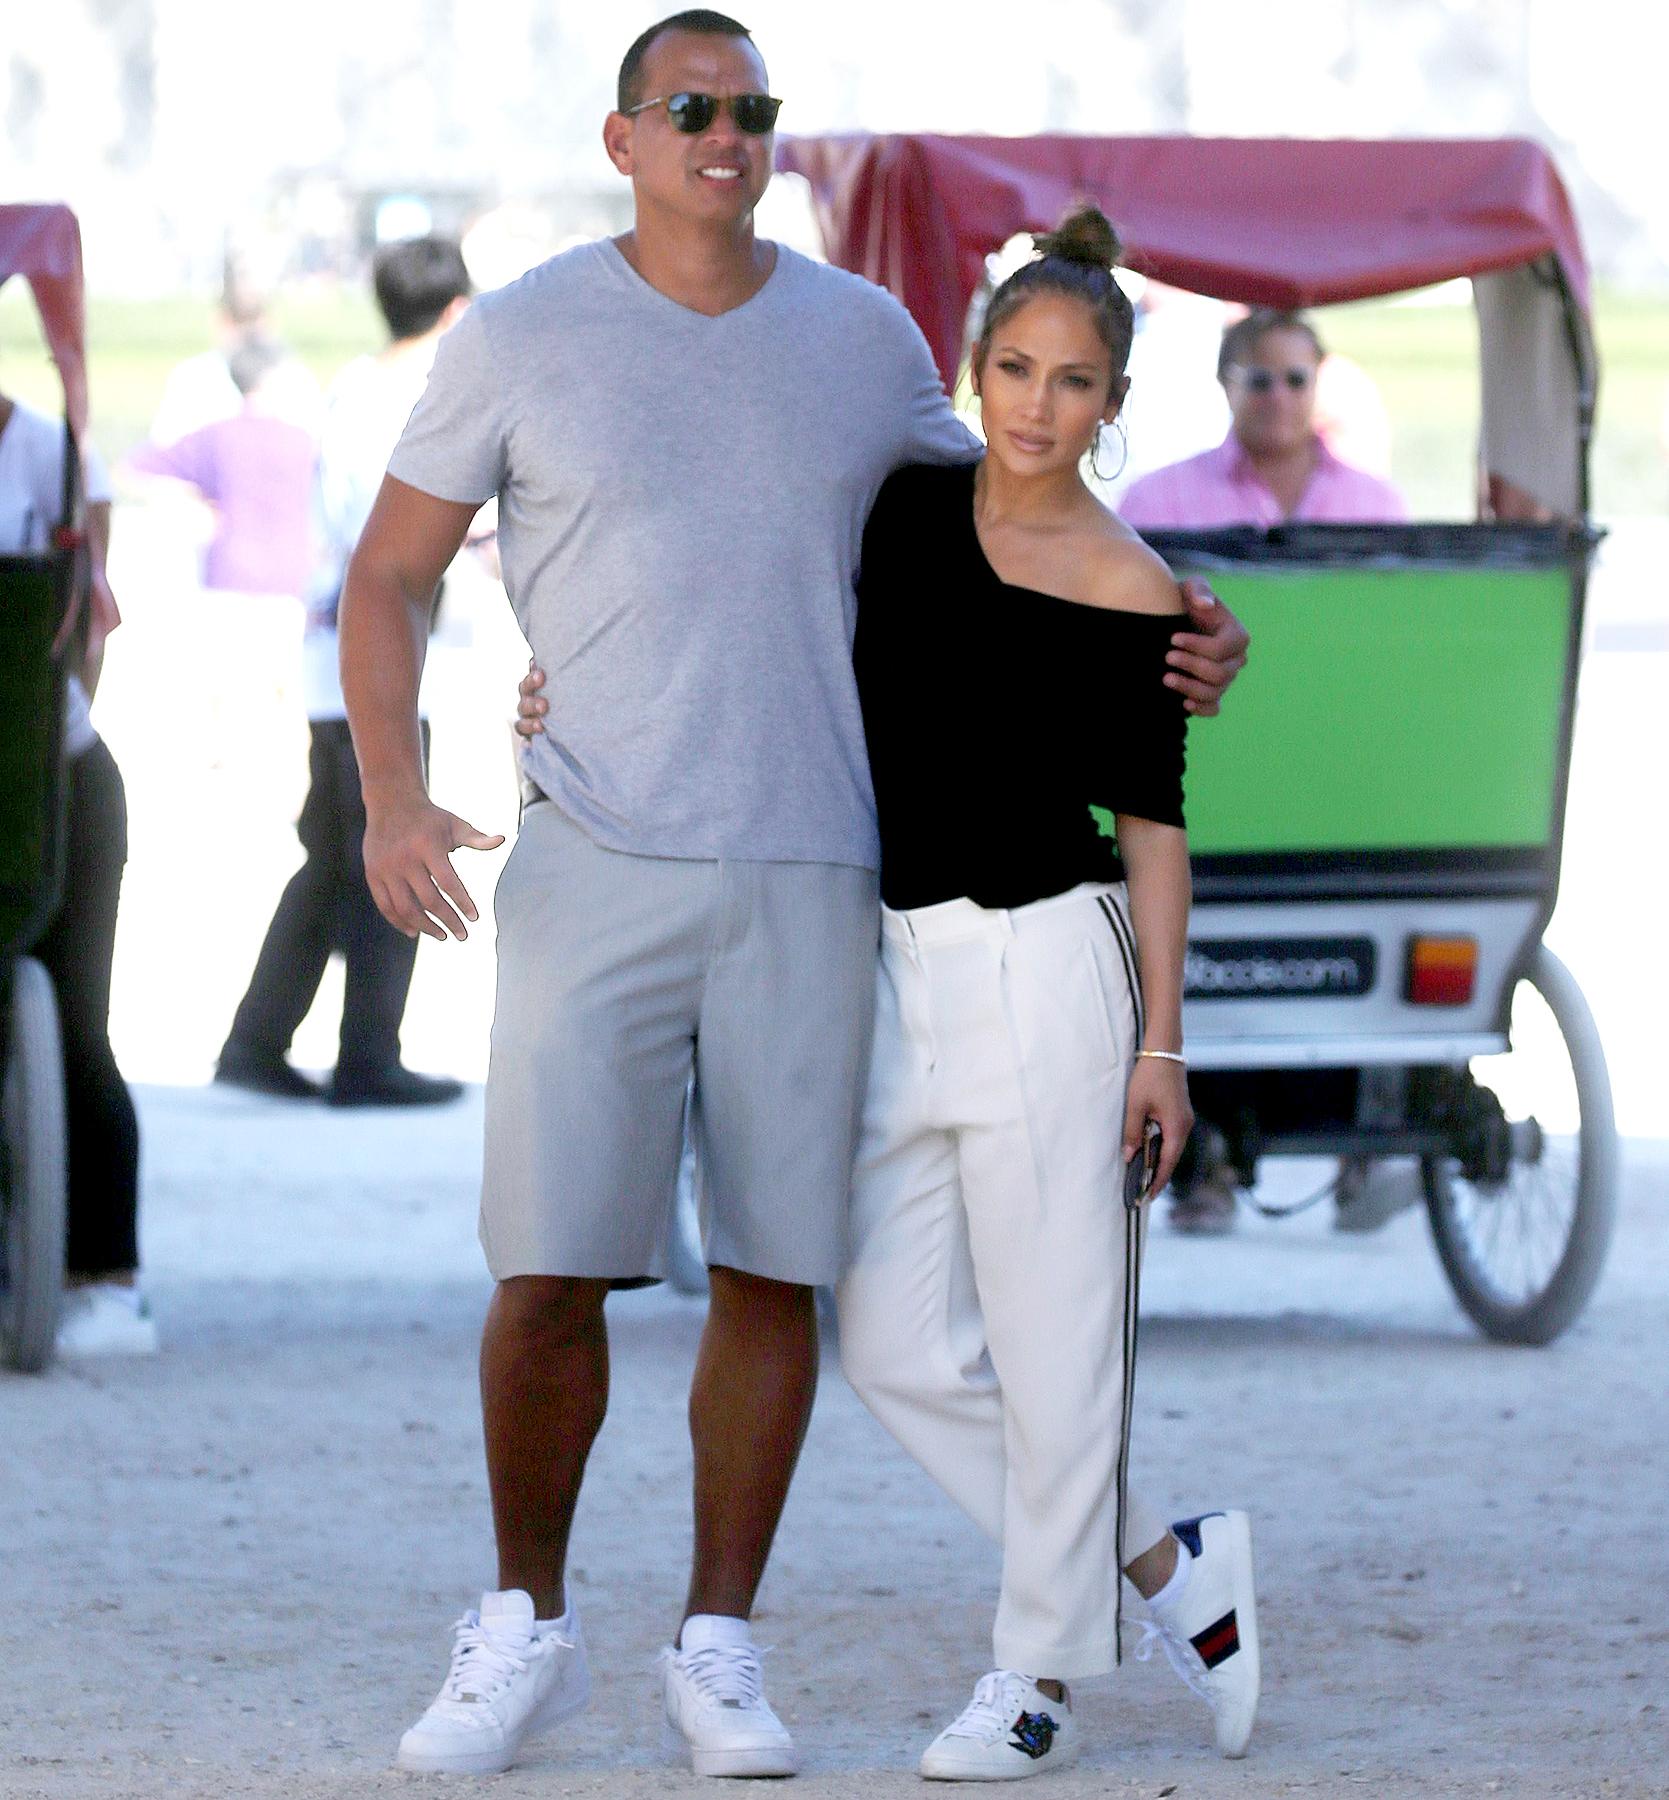 Jennifer Lopez and Alex Rodriguez take a stroll in Paris on June 18, 2017.